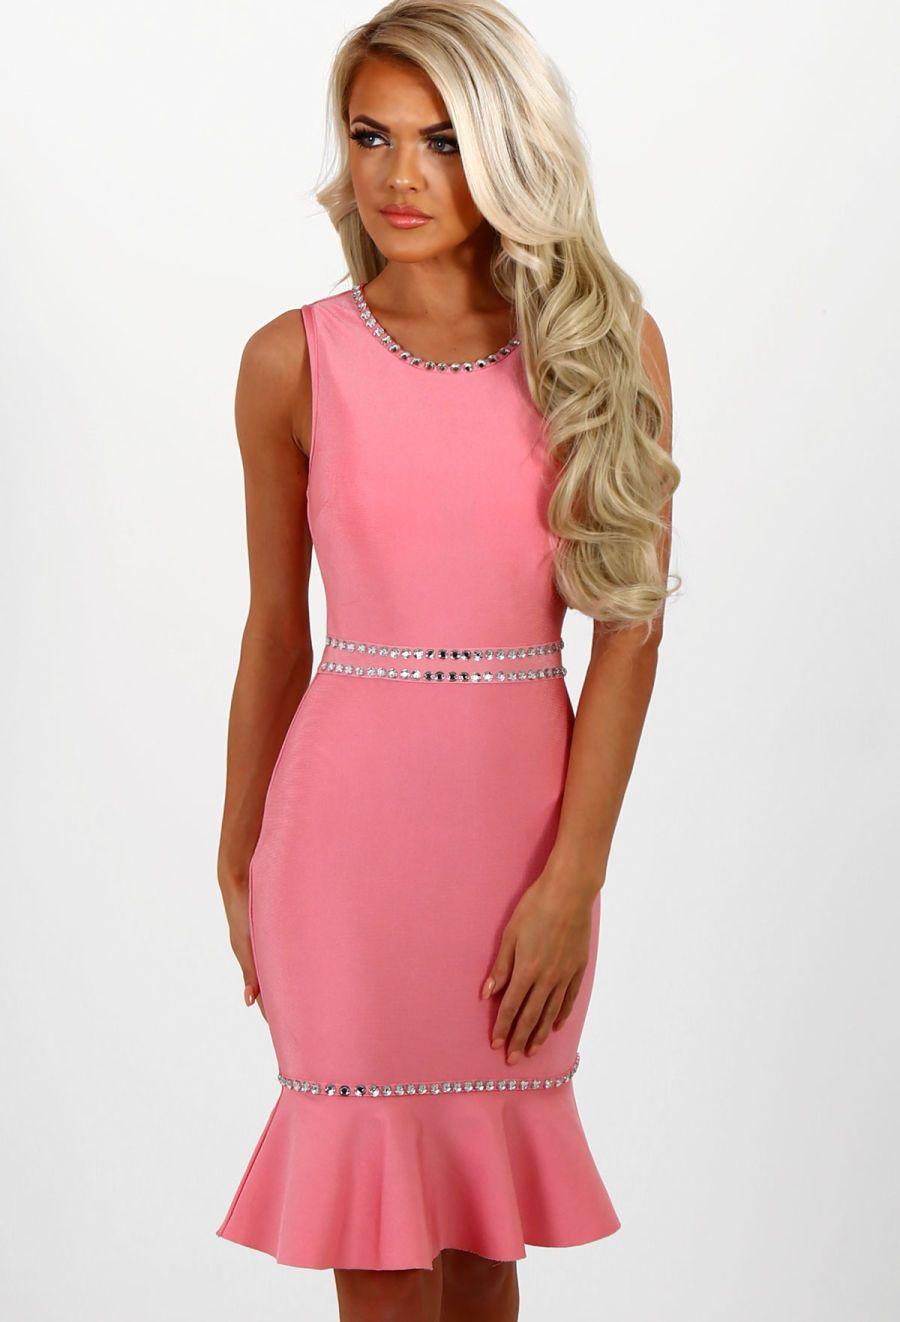 Lady marmalade pink diamante bandage mini dress mini dresses pink